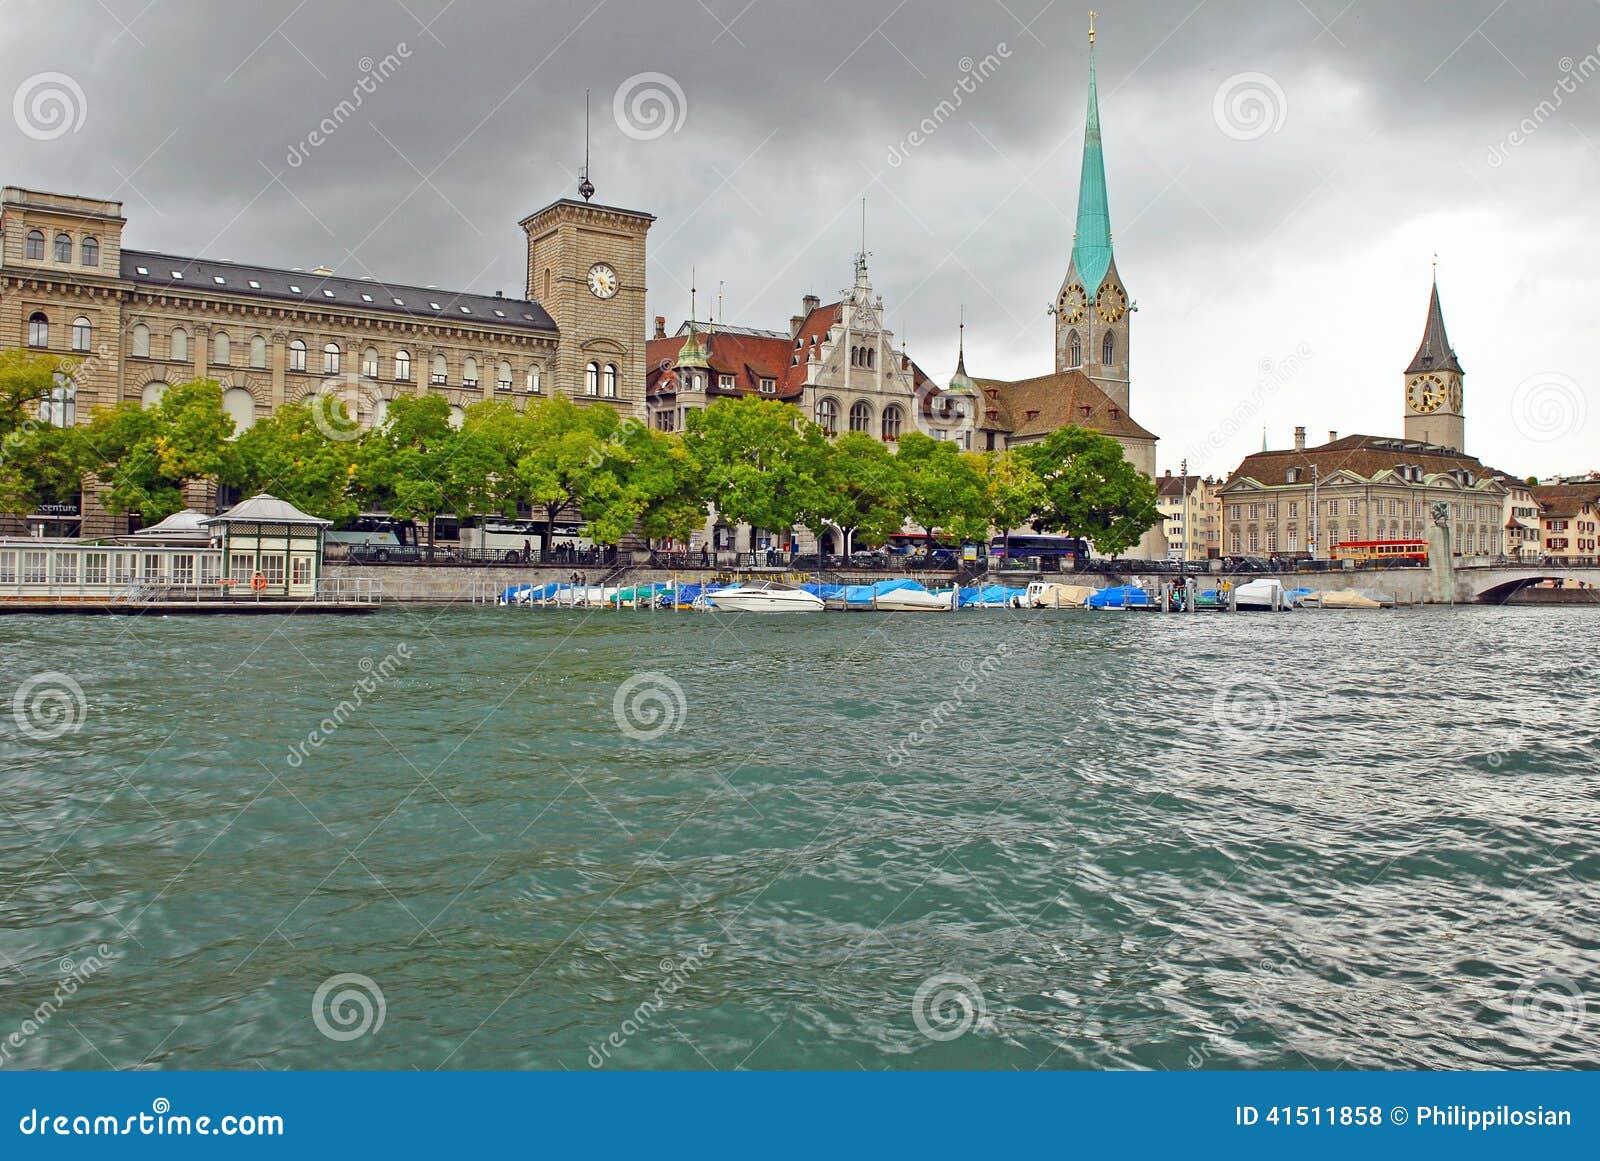 Limmatrivier en Zürich Van de binnenstad, Zwitserland